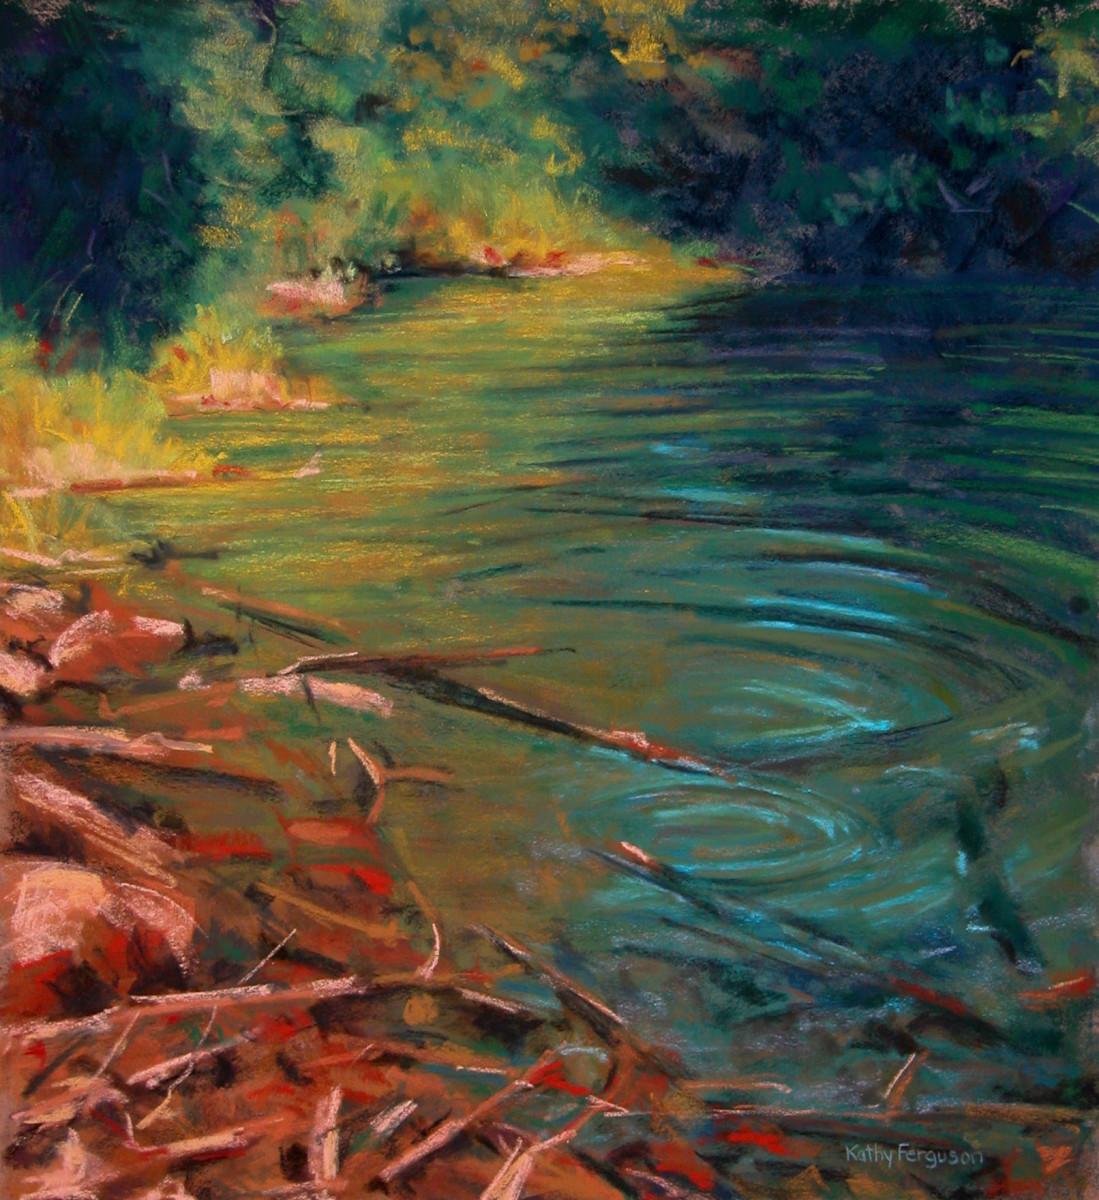 Pond Ripples by Kathy Ferguson